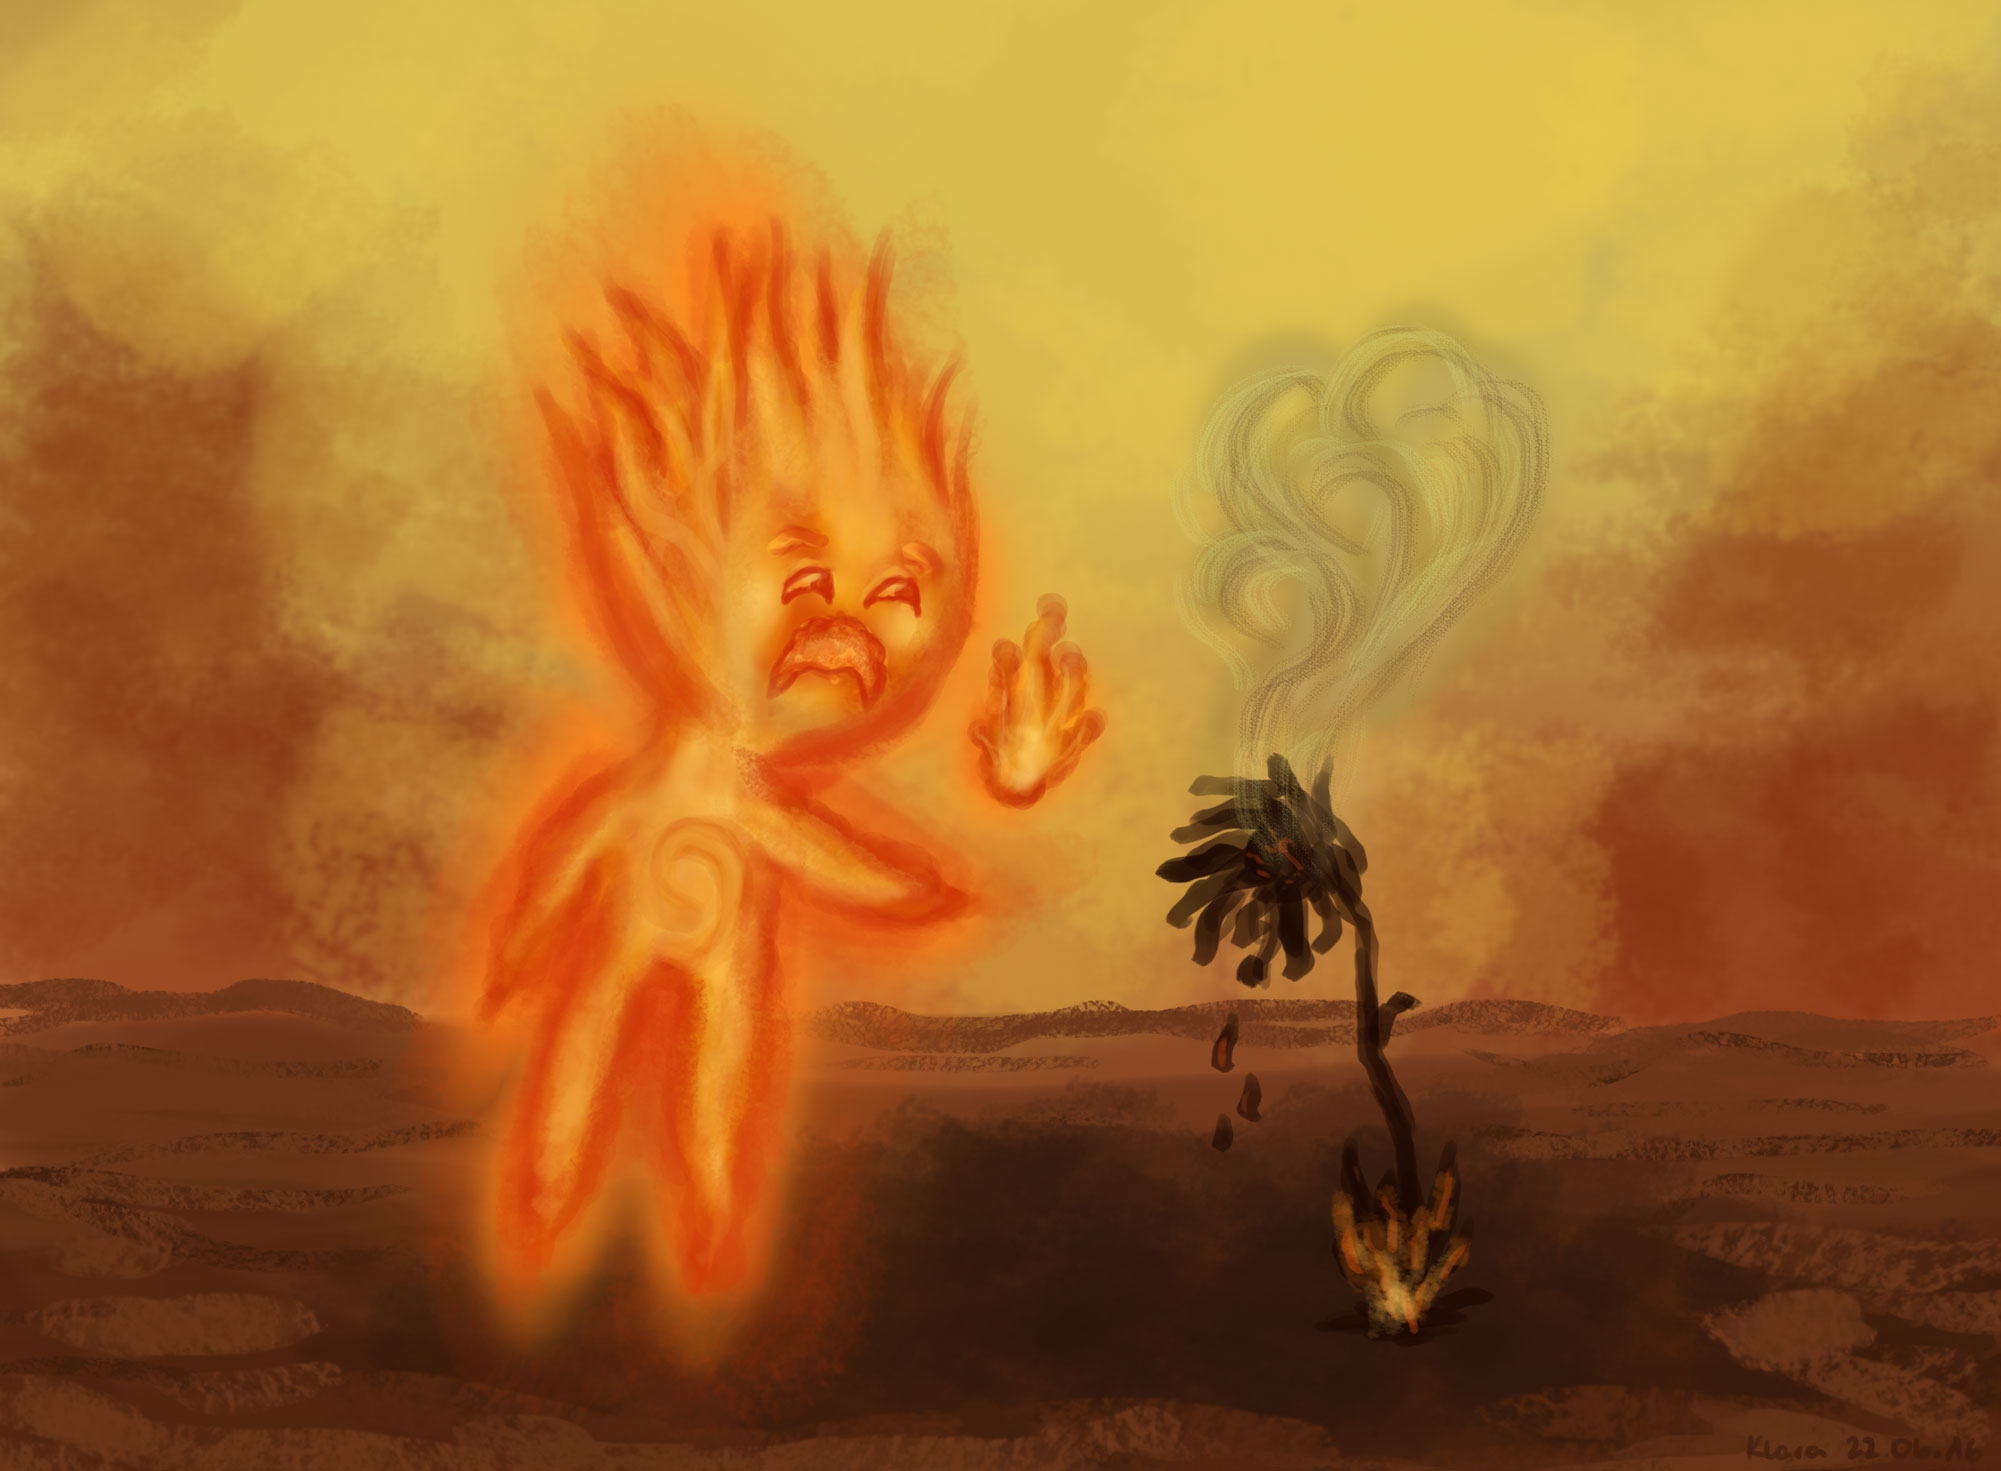 Young Fire Spirit